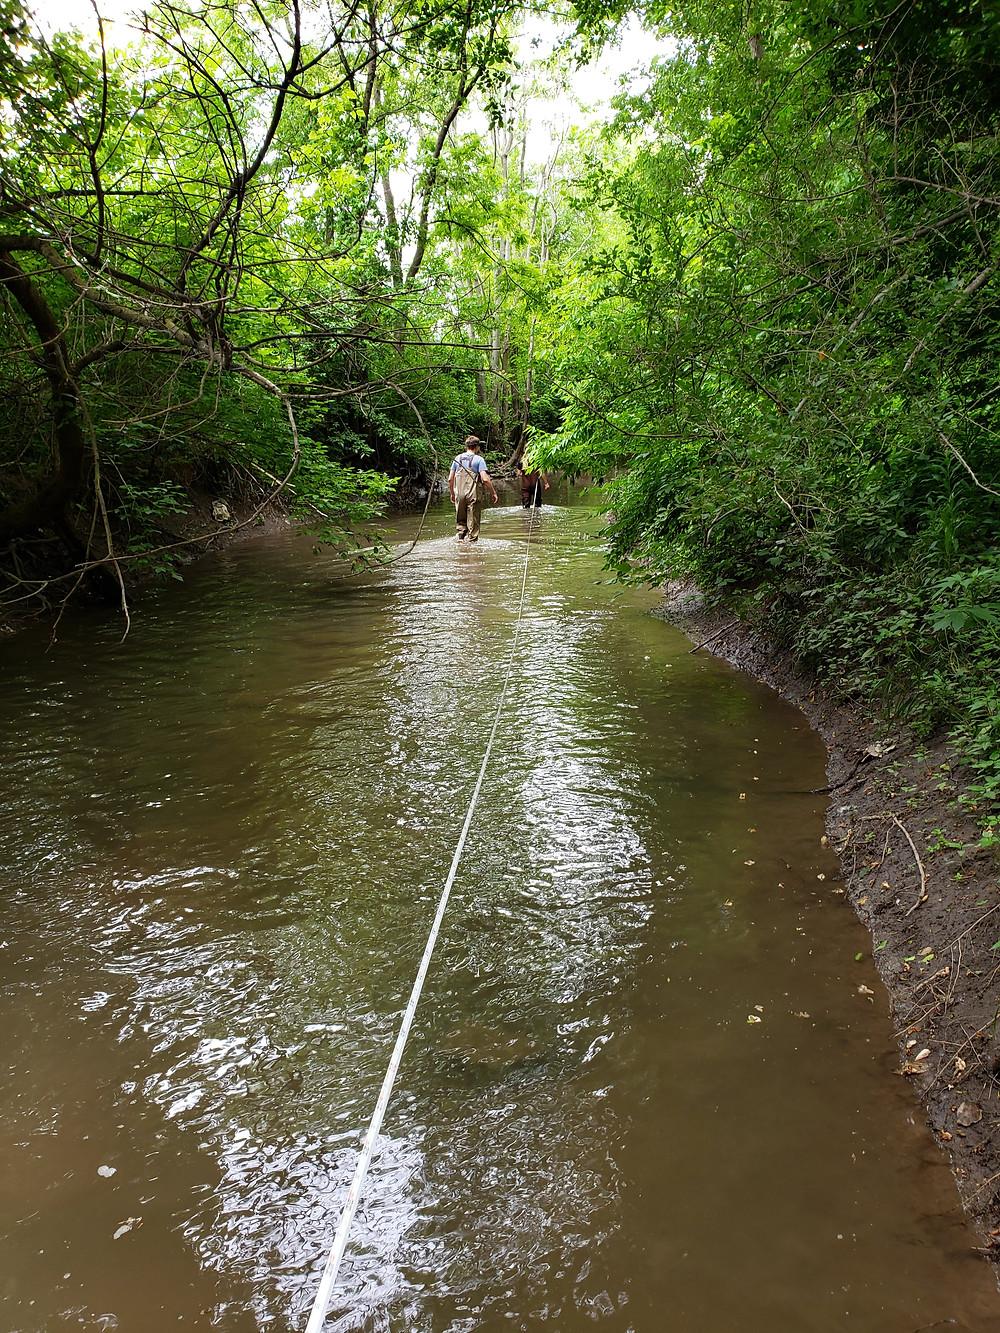 Reece in the stream